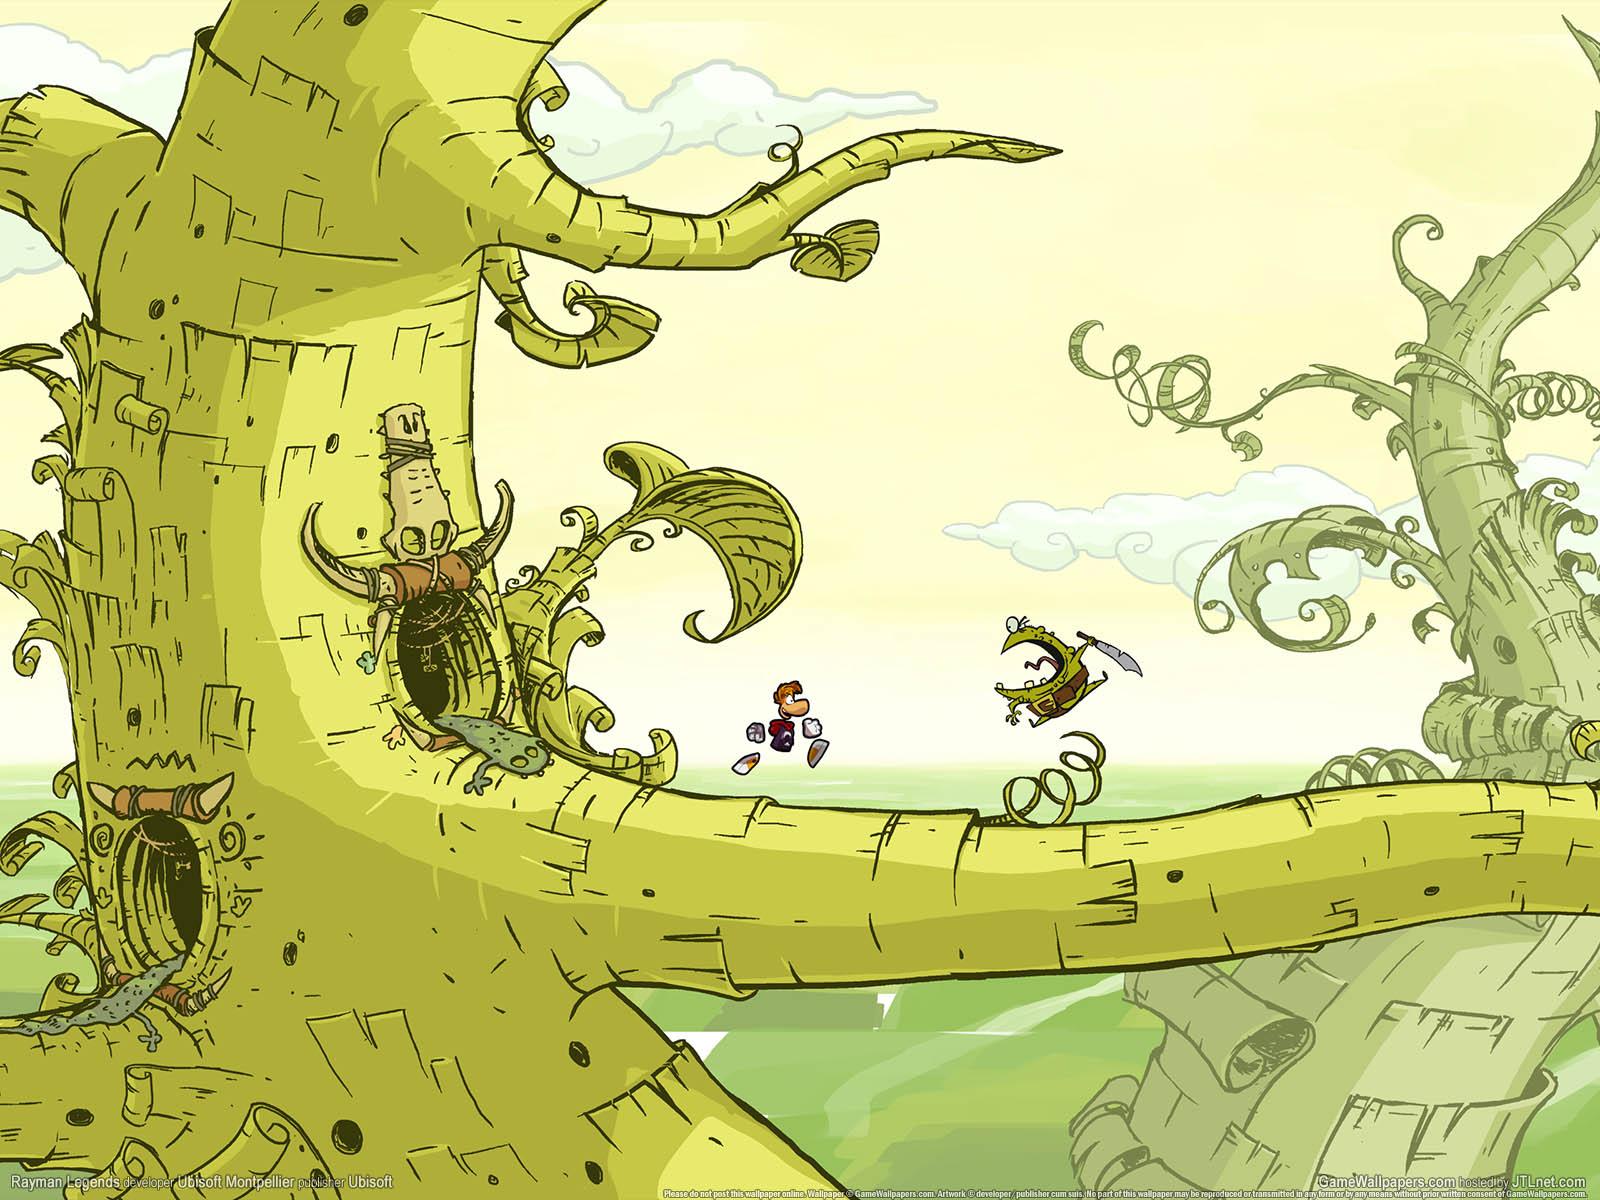 Rayman Legendsνmmer=02 achtergrond  1600x1200